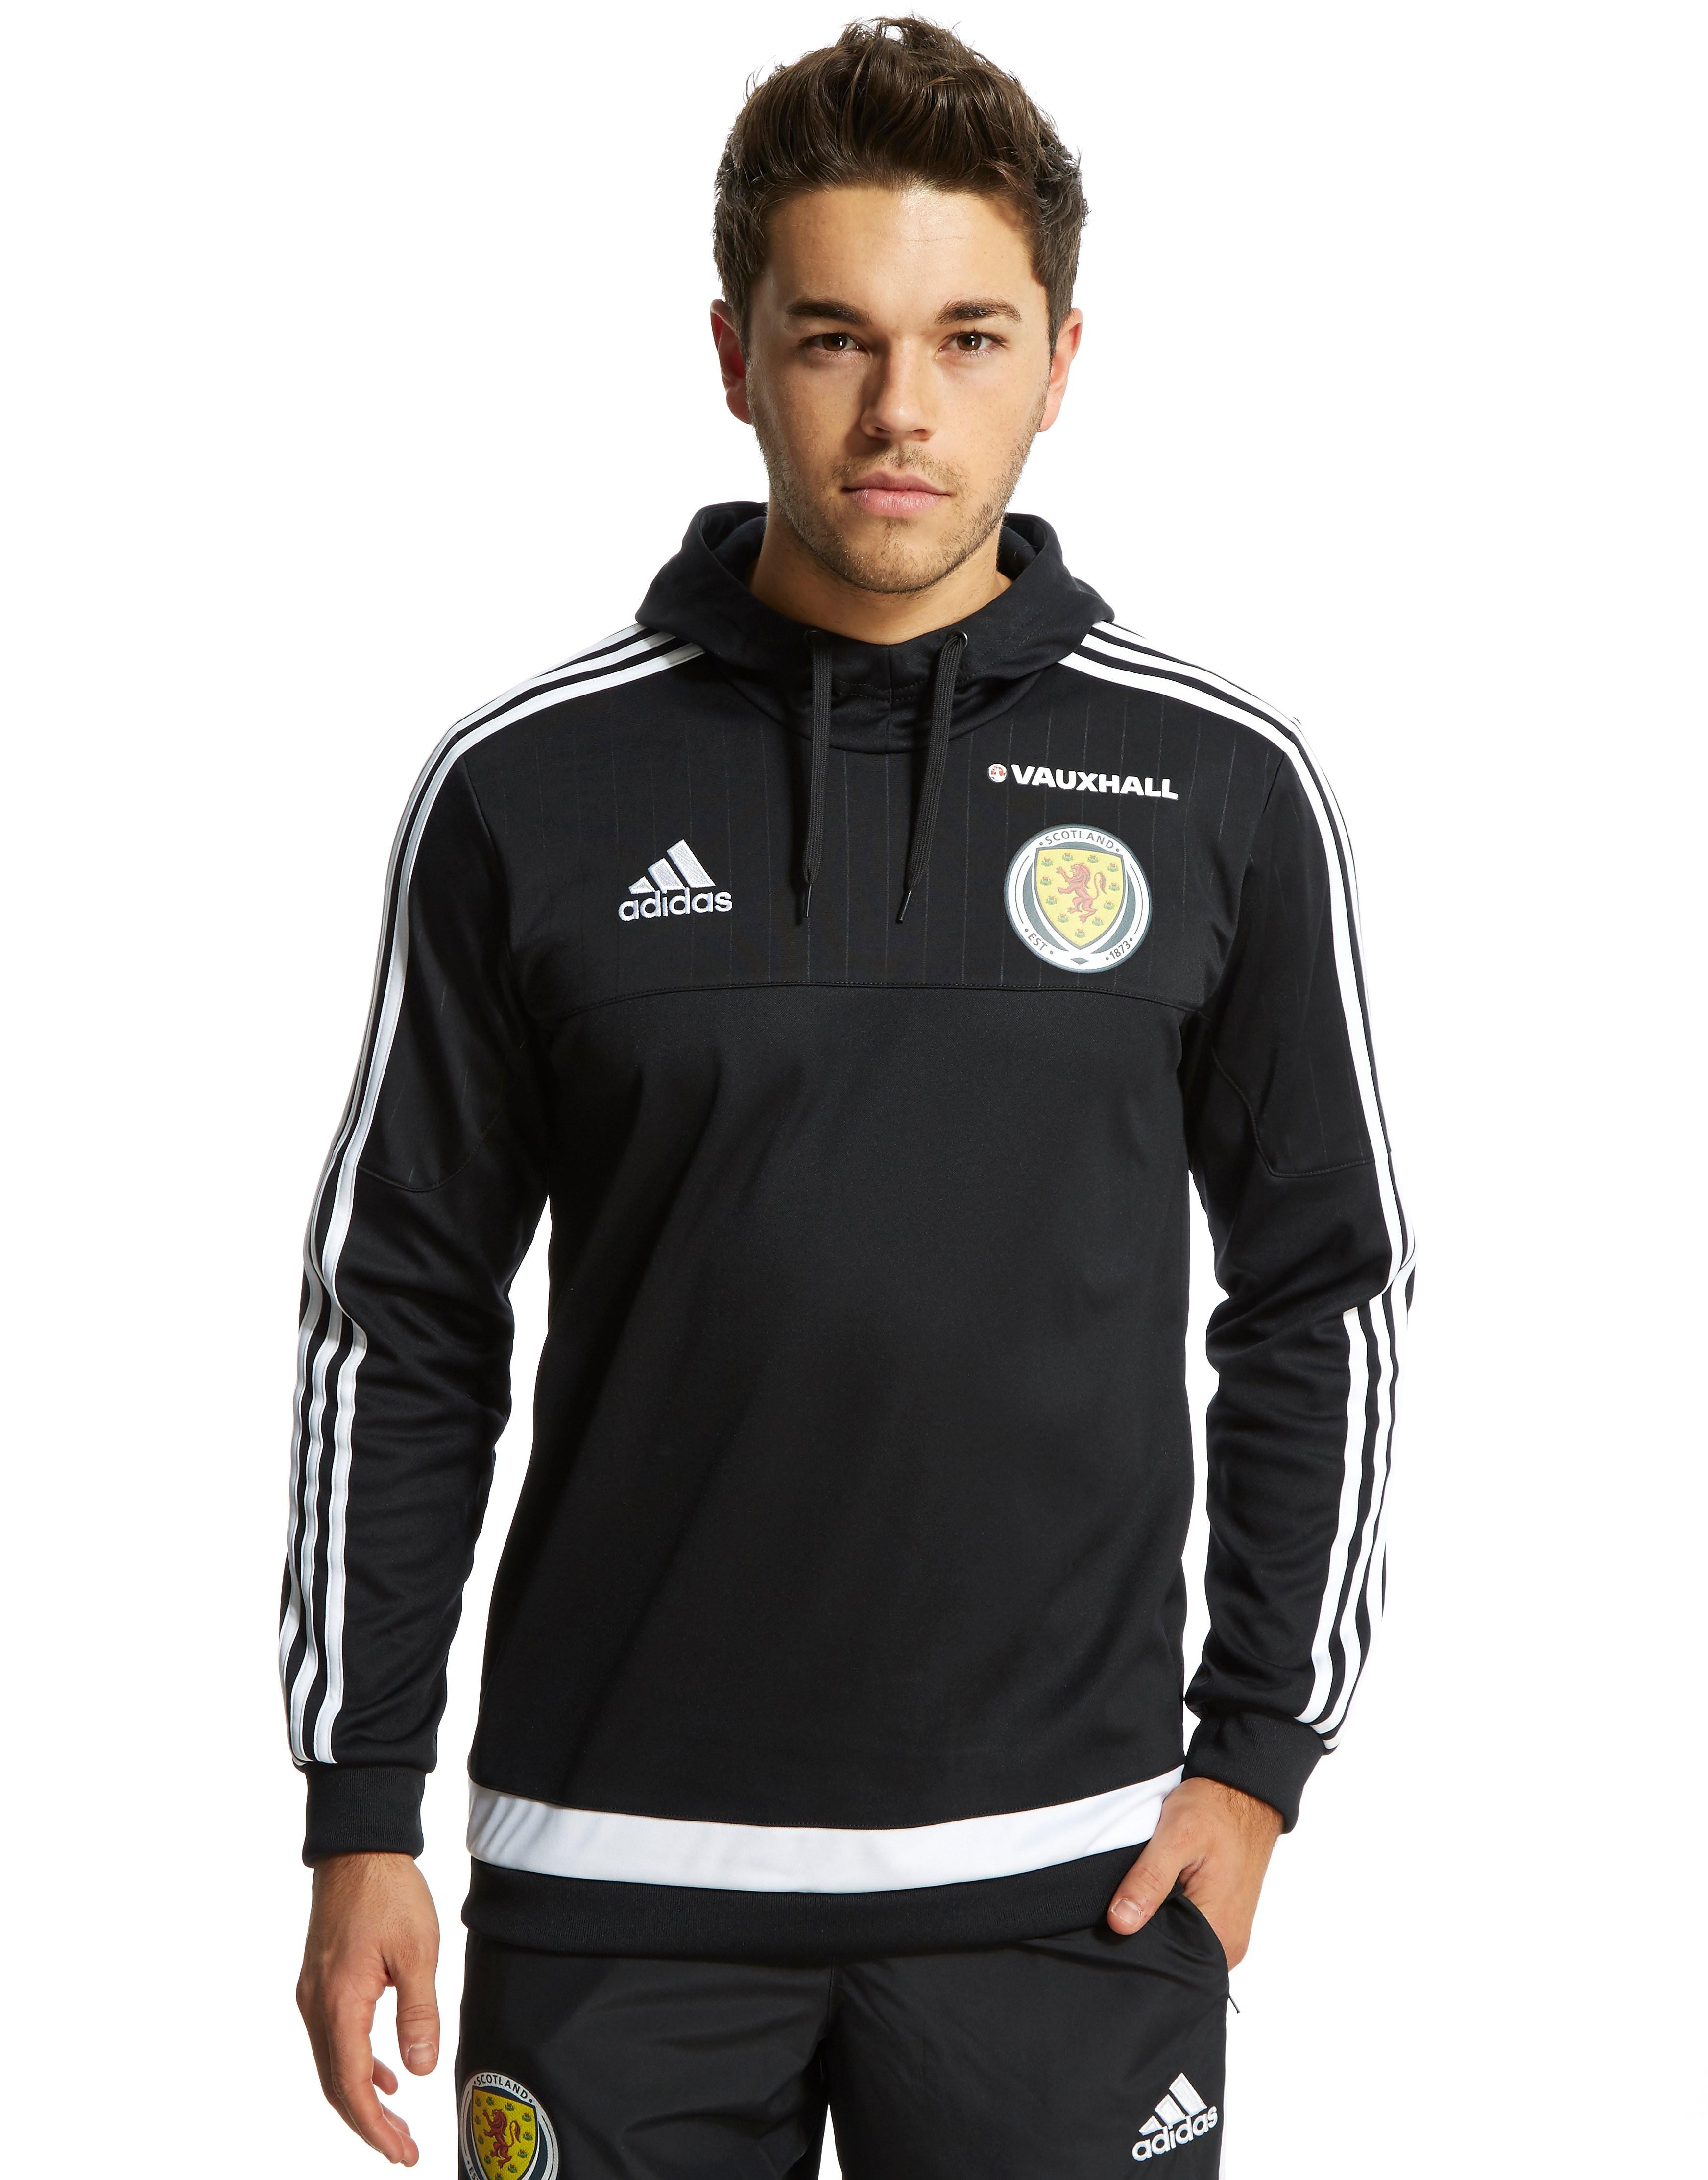 adidas Schotland FA 2015/16 topje met capuchon